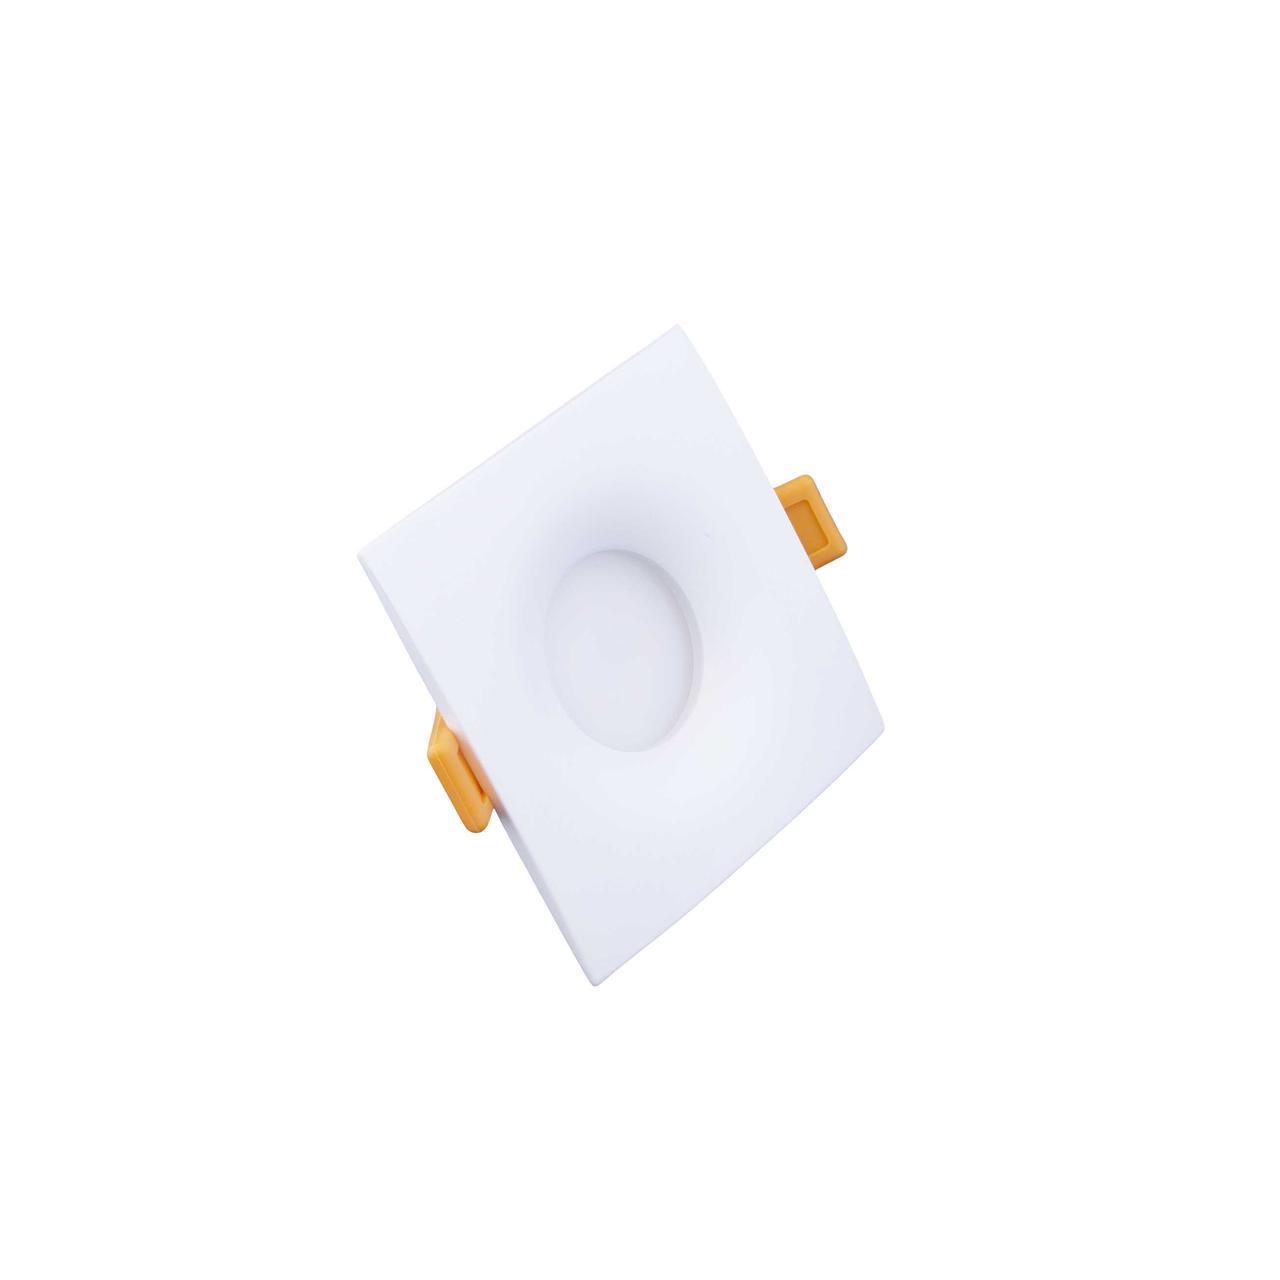 Led спот врезной квадрат белый TH3912 WH